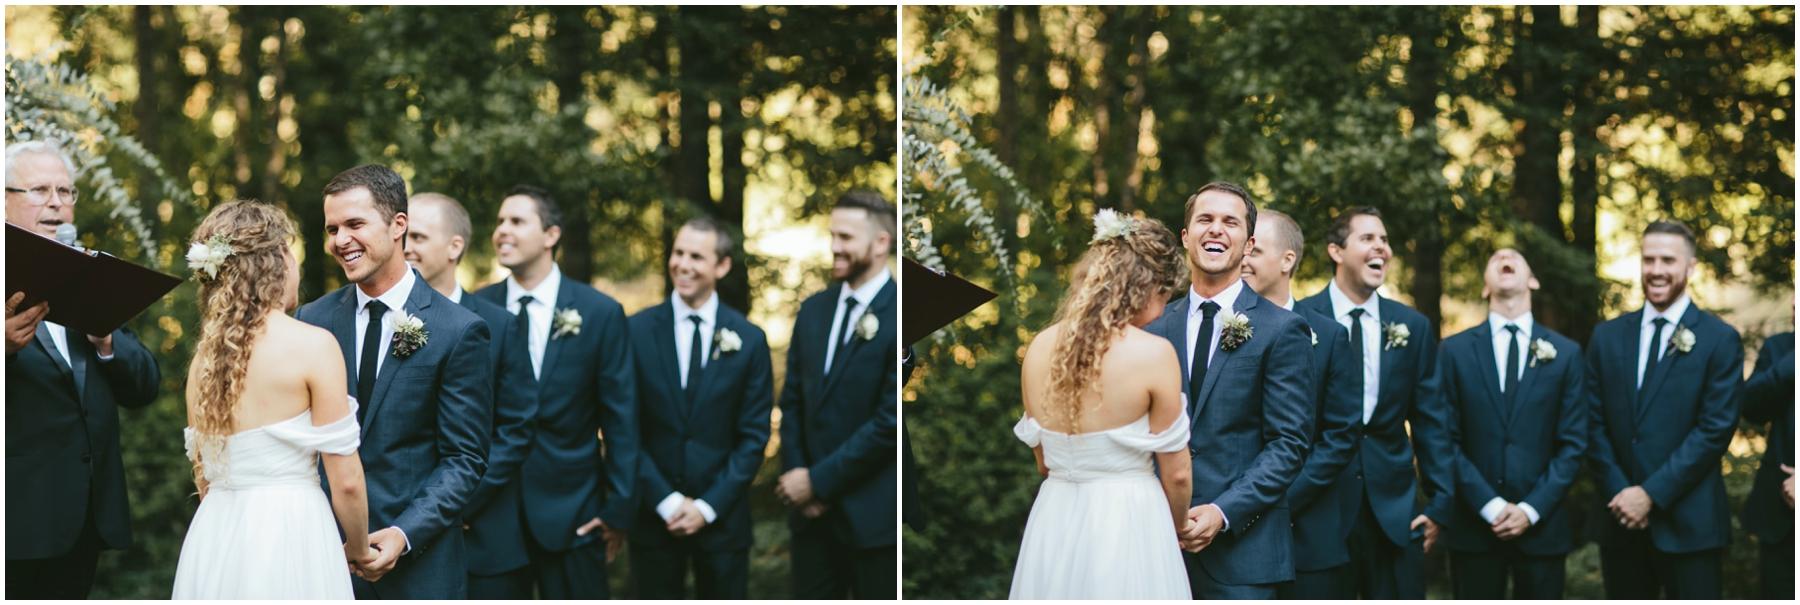 Emily+Paul-WEDDING_KellyBoitanoPhotography_0078